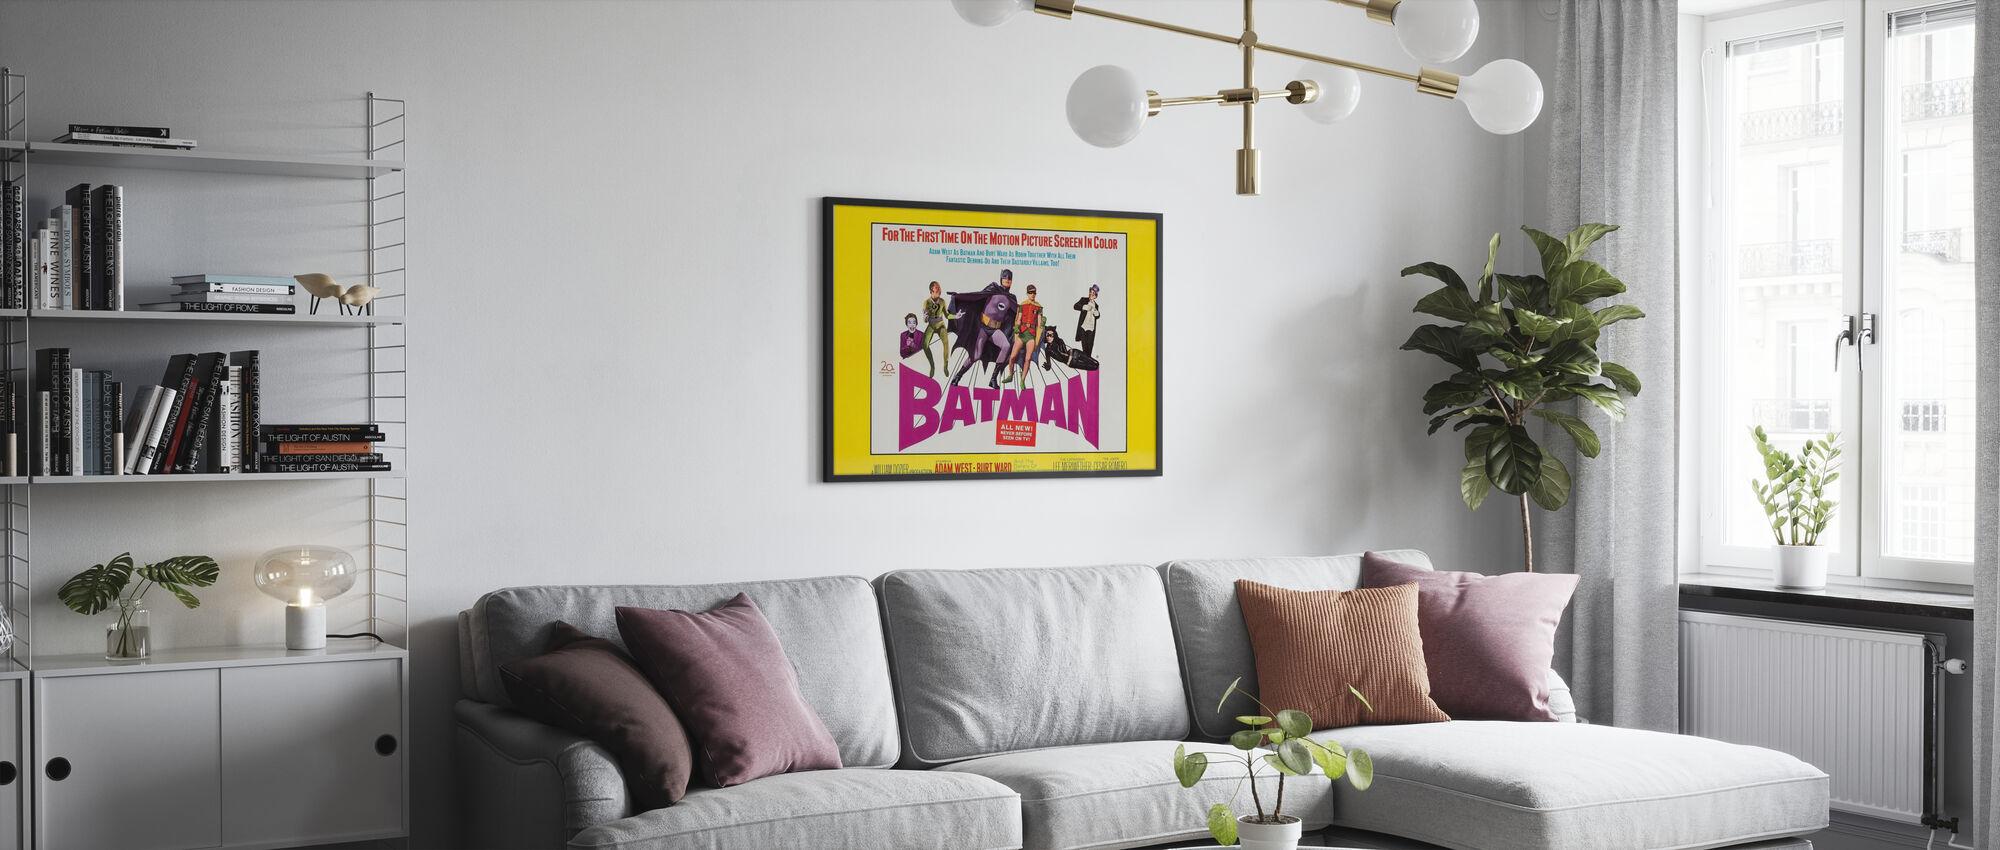 Batman the Movie - Poster - Living Room